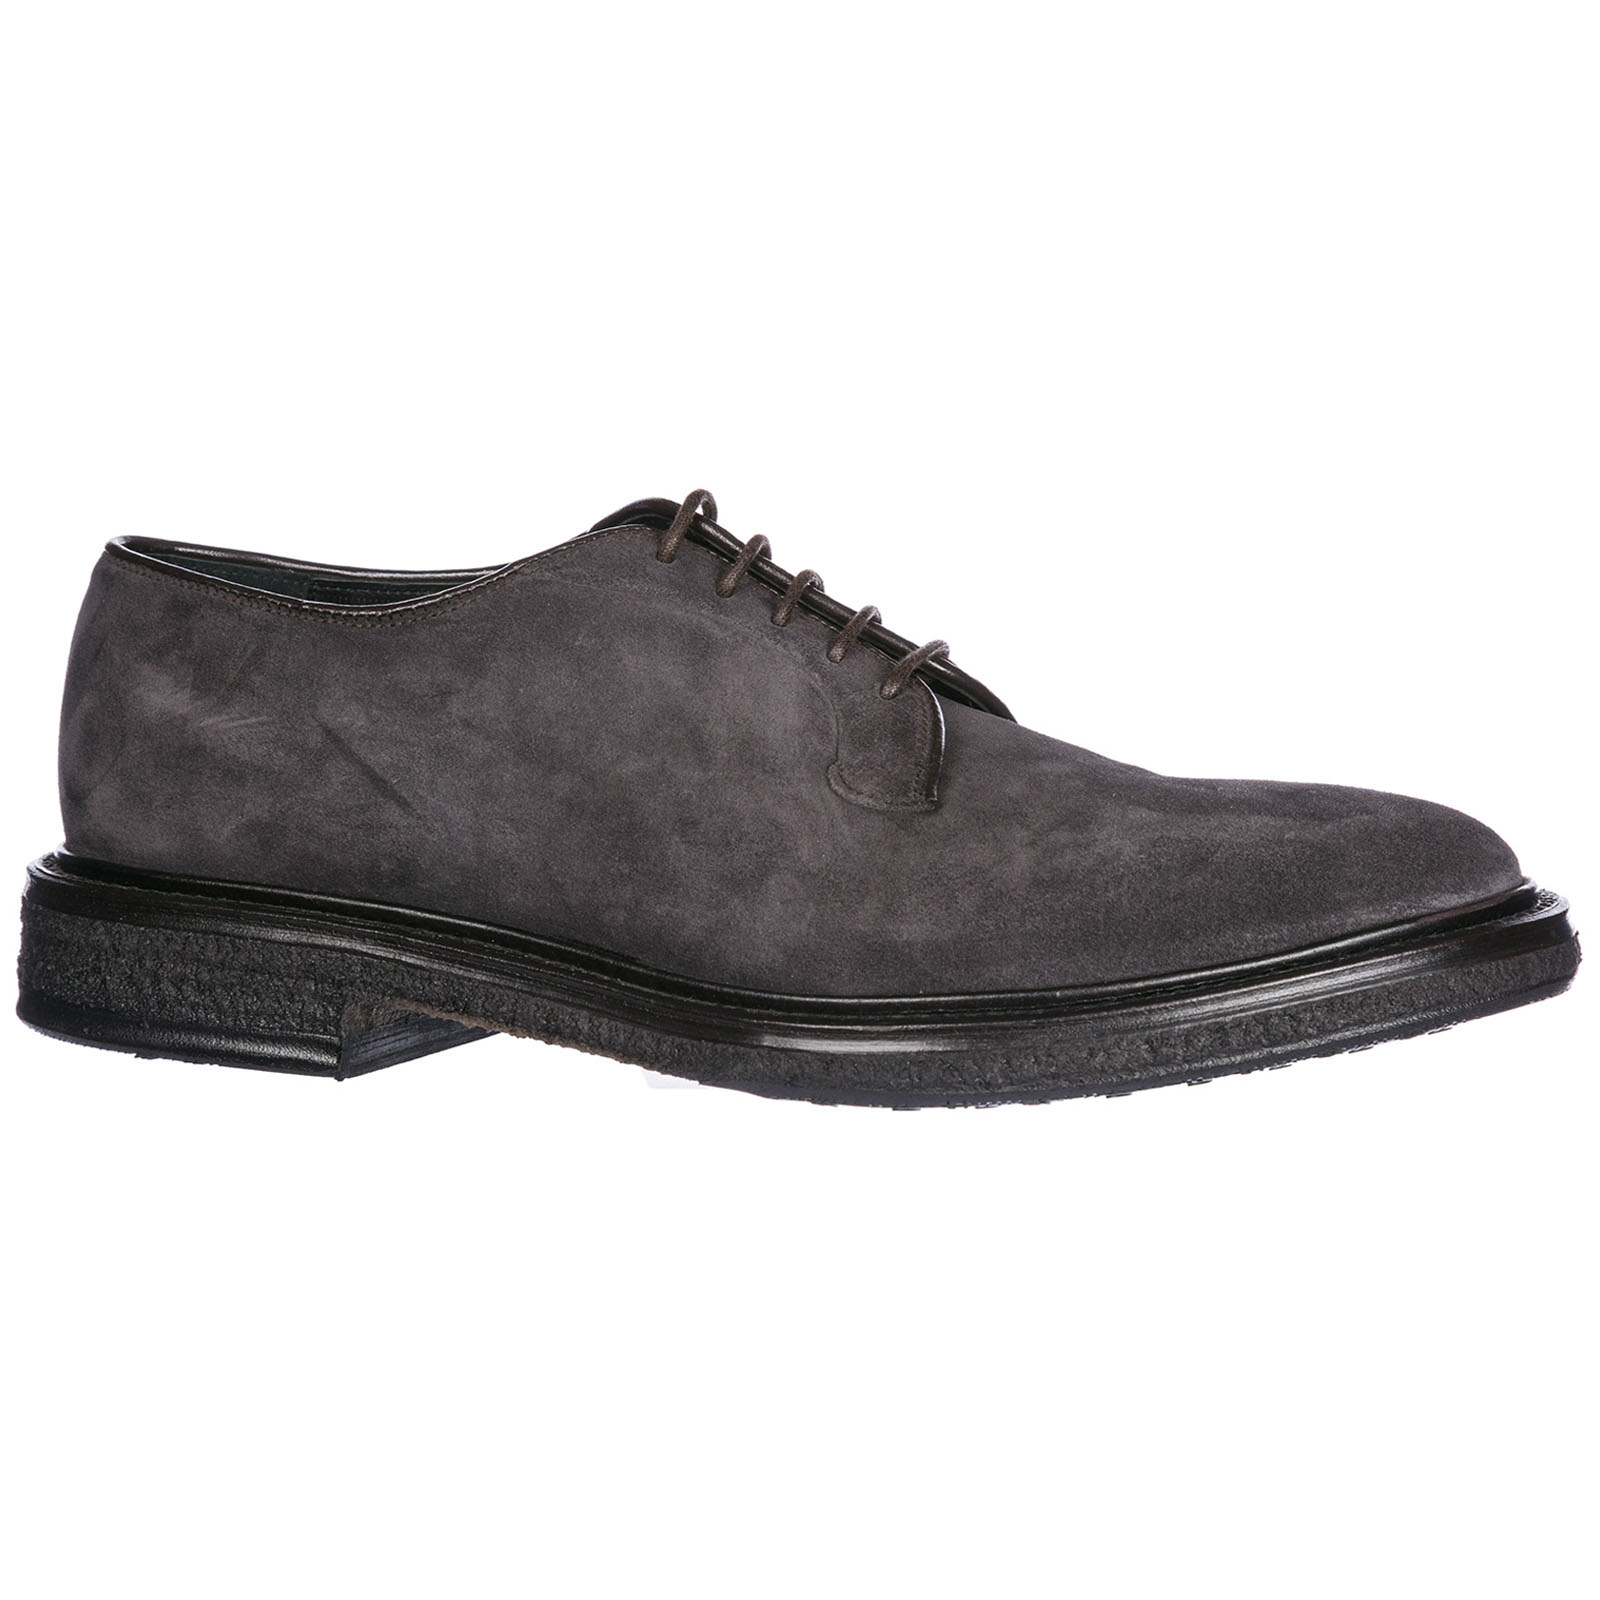 Premiata 30924 À Chaussures Lacets Dark Greese SwATZxqHg